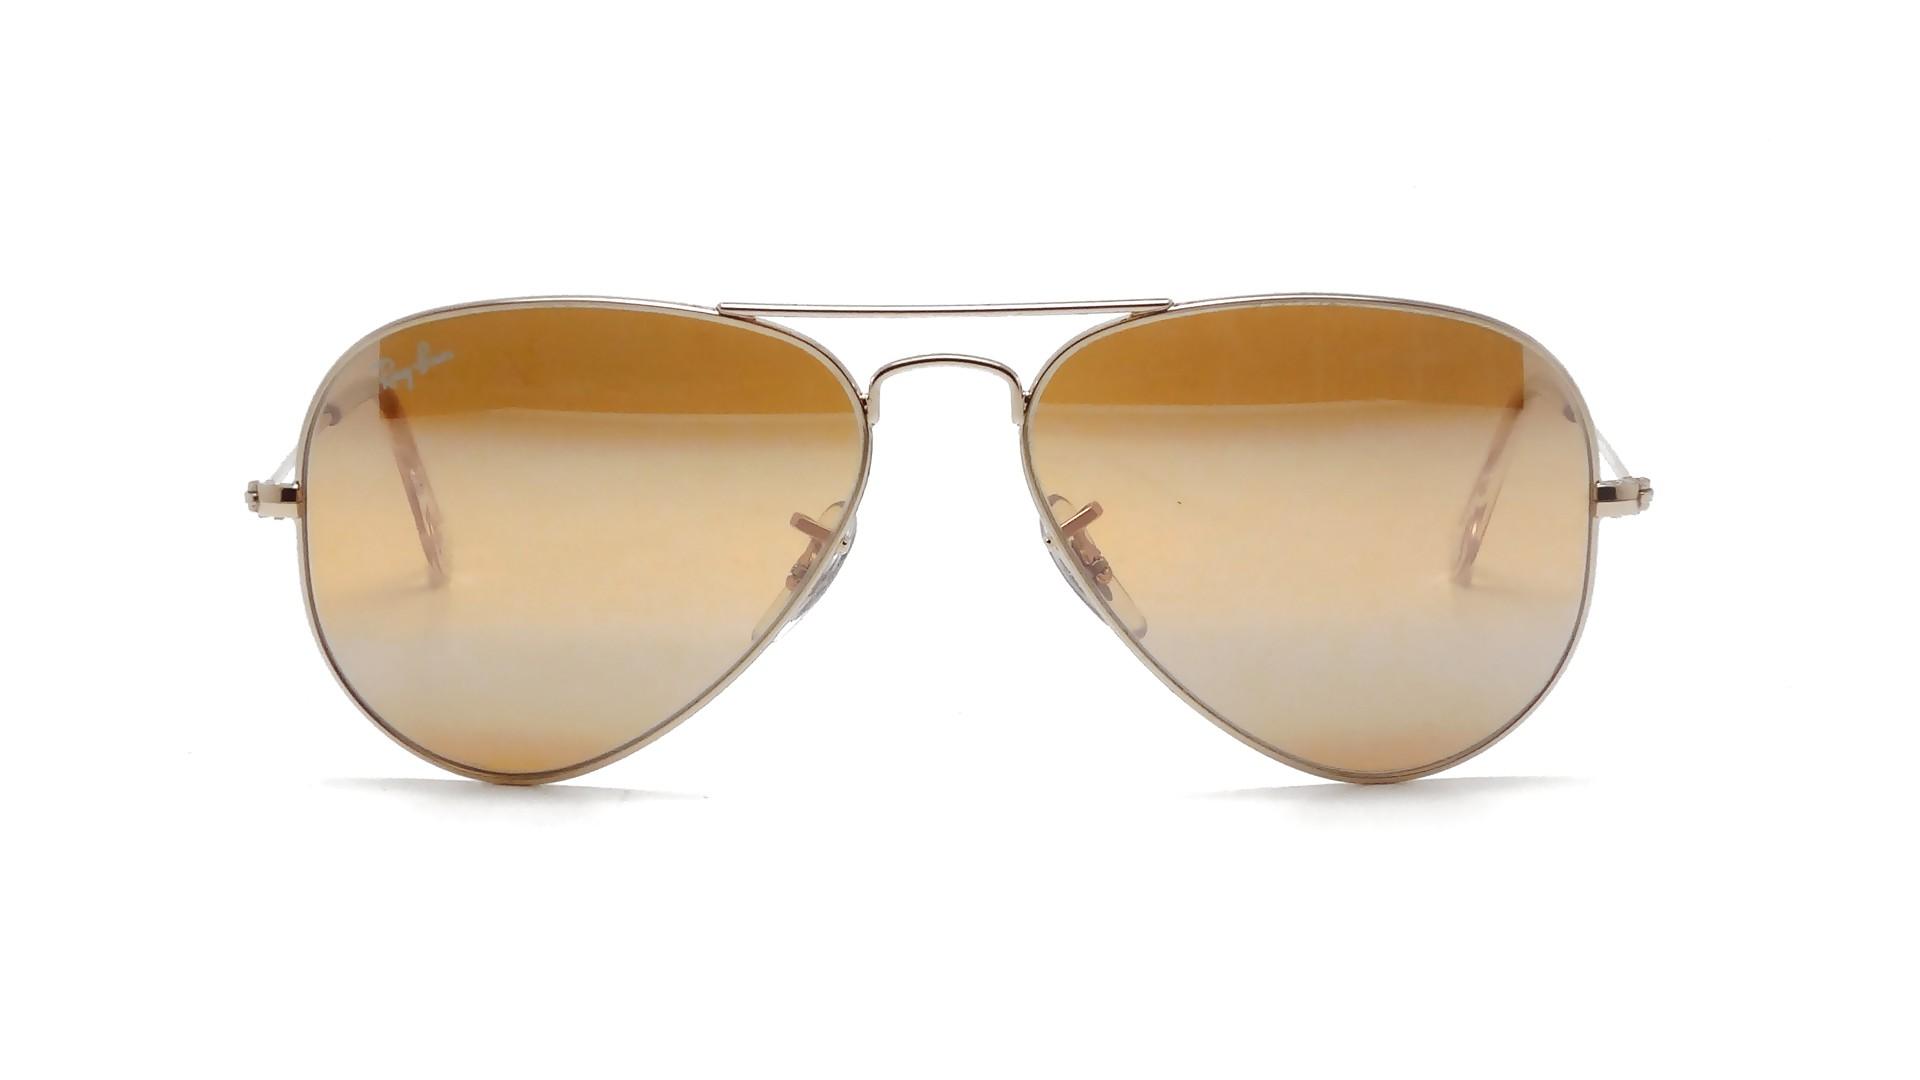 Ray ban aviator metal or rb3025 001 3k 55 14 prix 99 90 for Lunettes de soleil ray ban aviator miroir